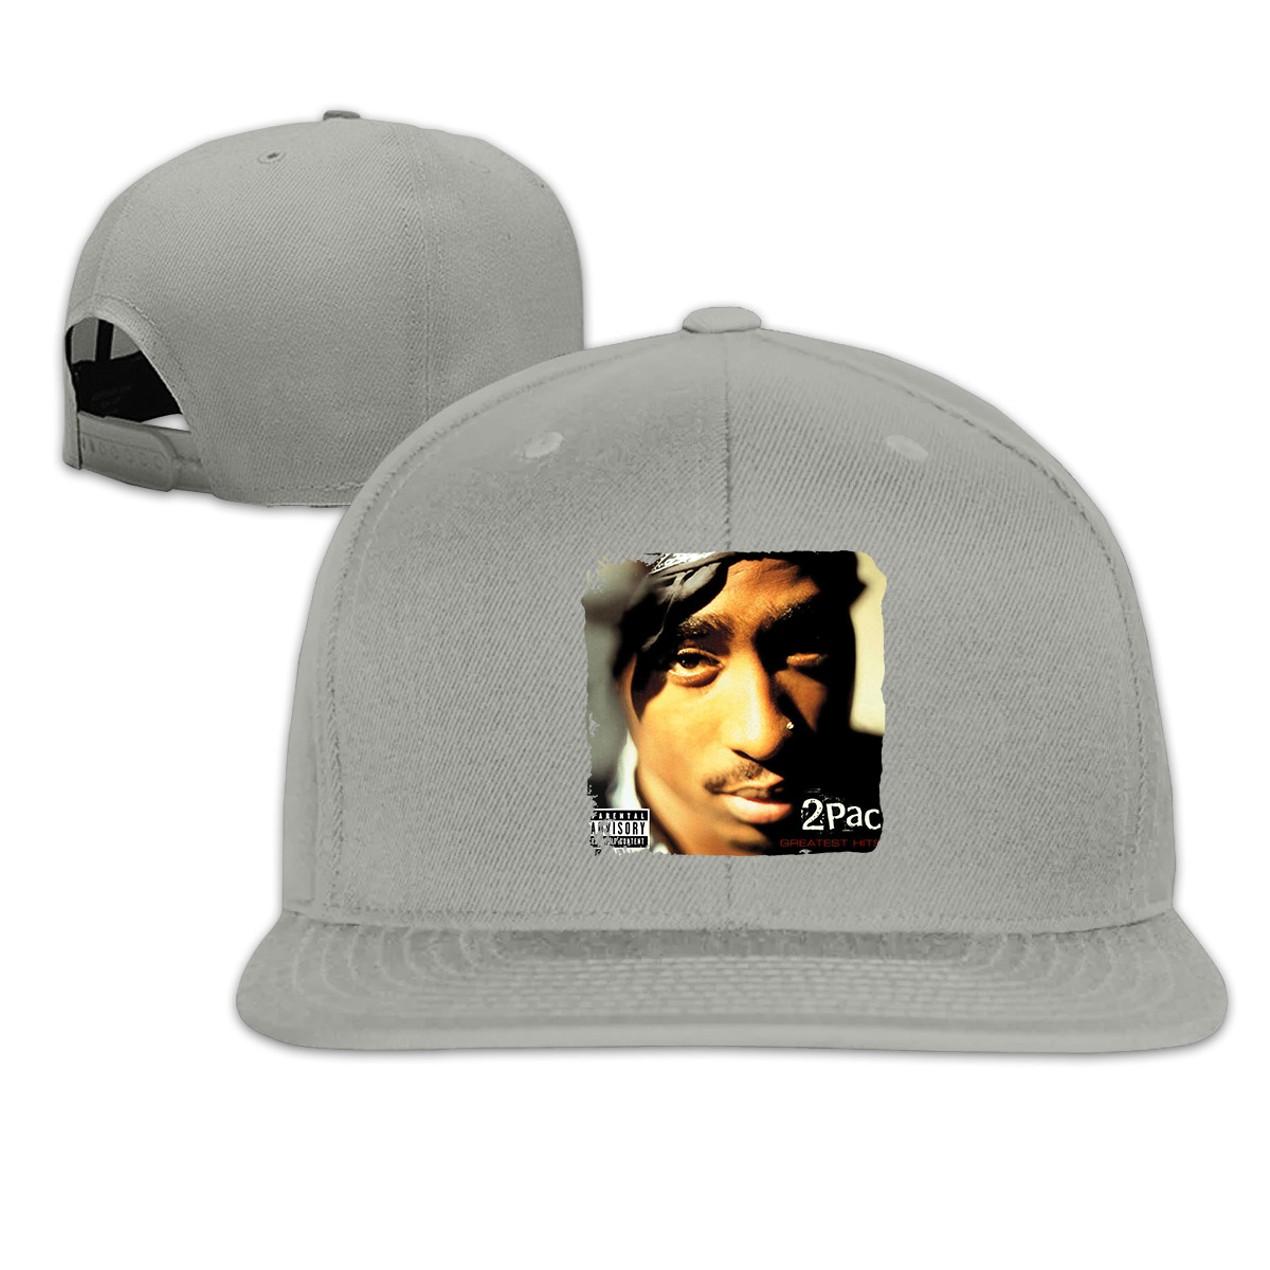 2 Chainz Collegrove Snapback Baseball Caps Flat Hat - Tanga